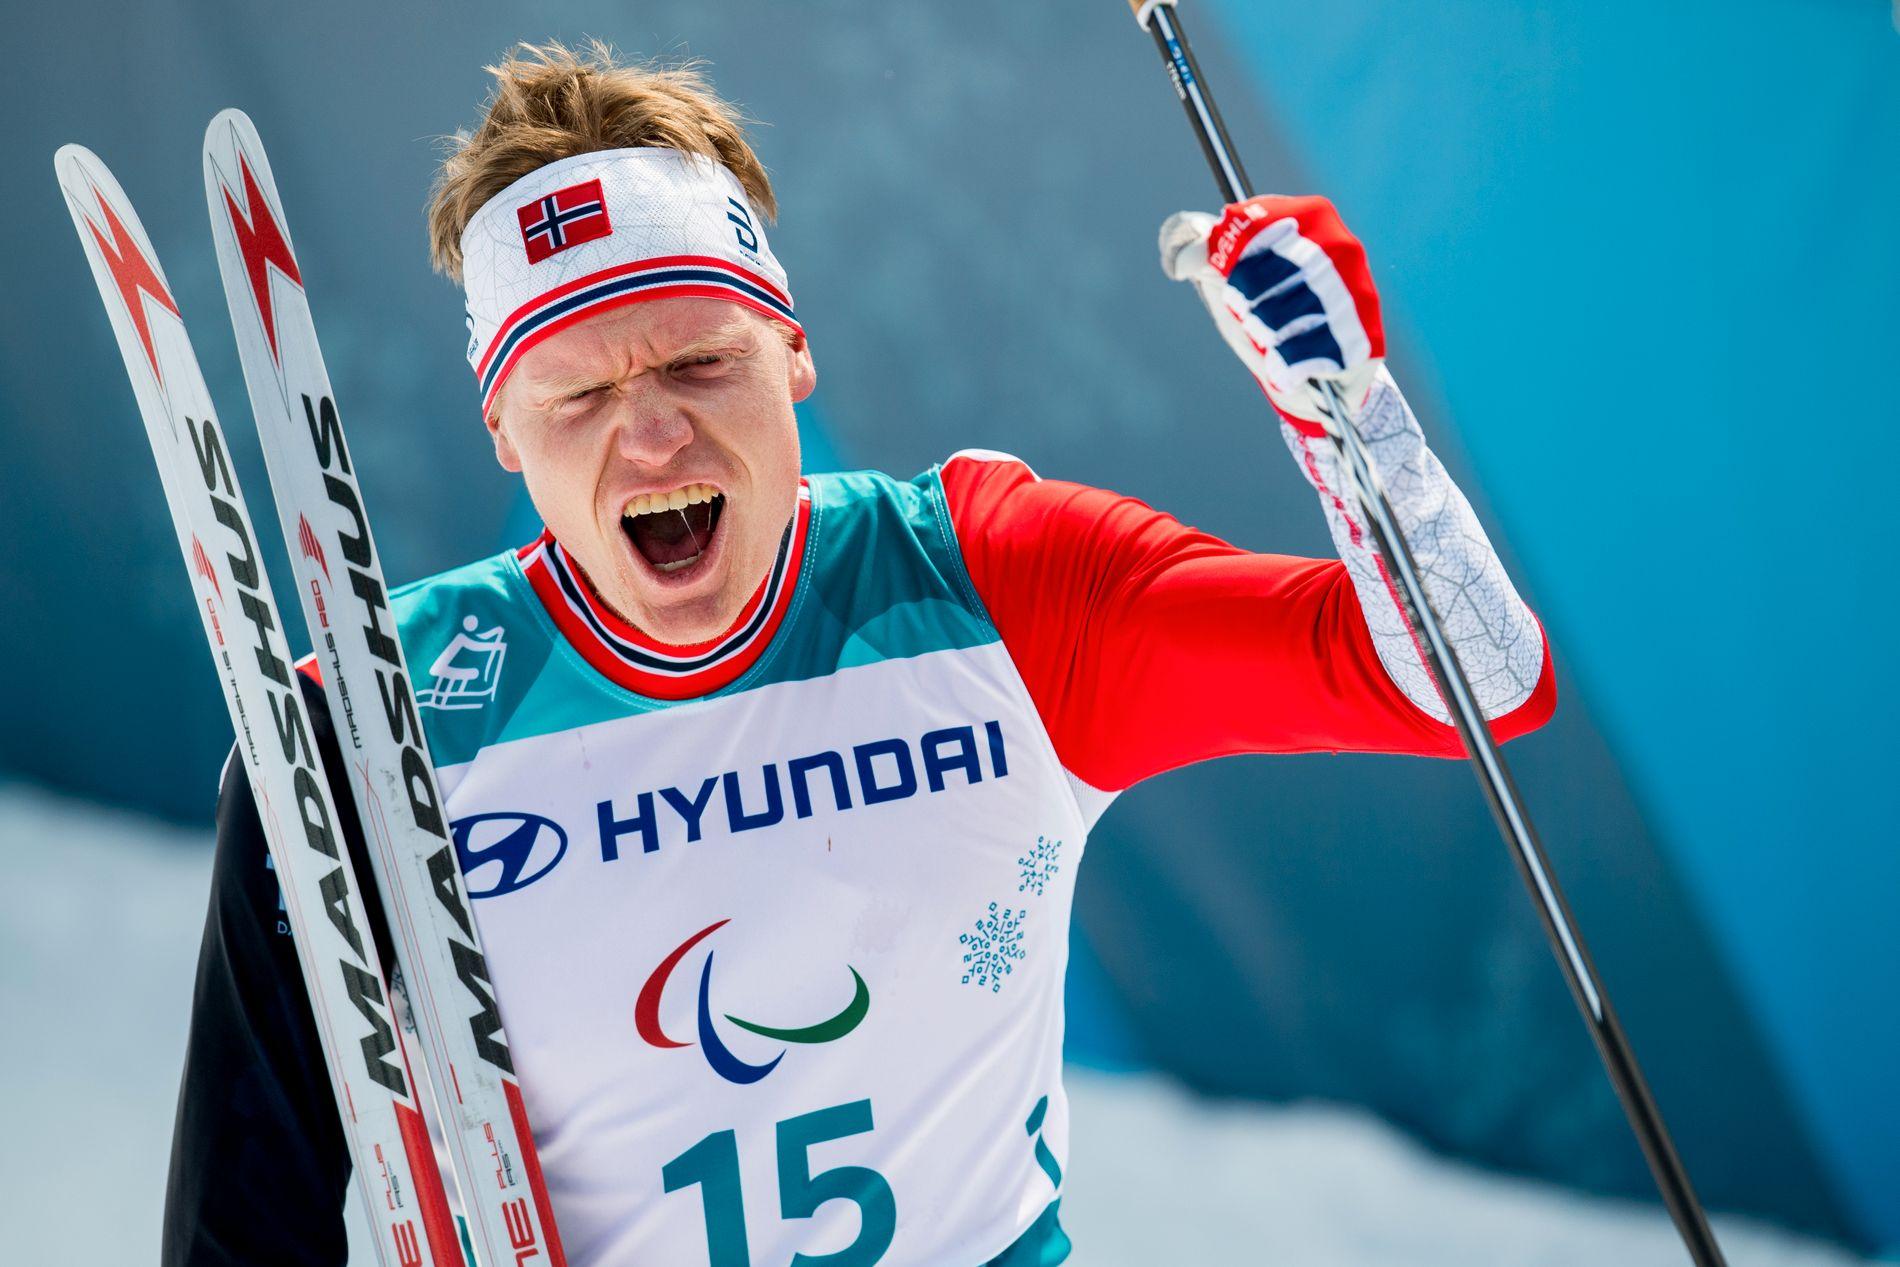 JUBLER: Håkon Olsrud jubler for bronsemedalje i Pyeongchang.